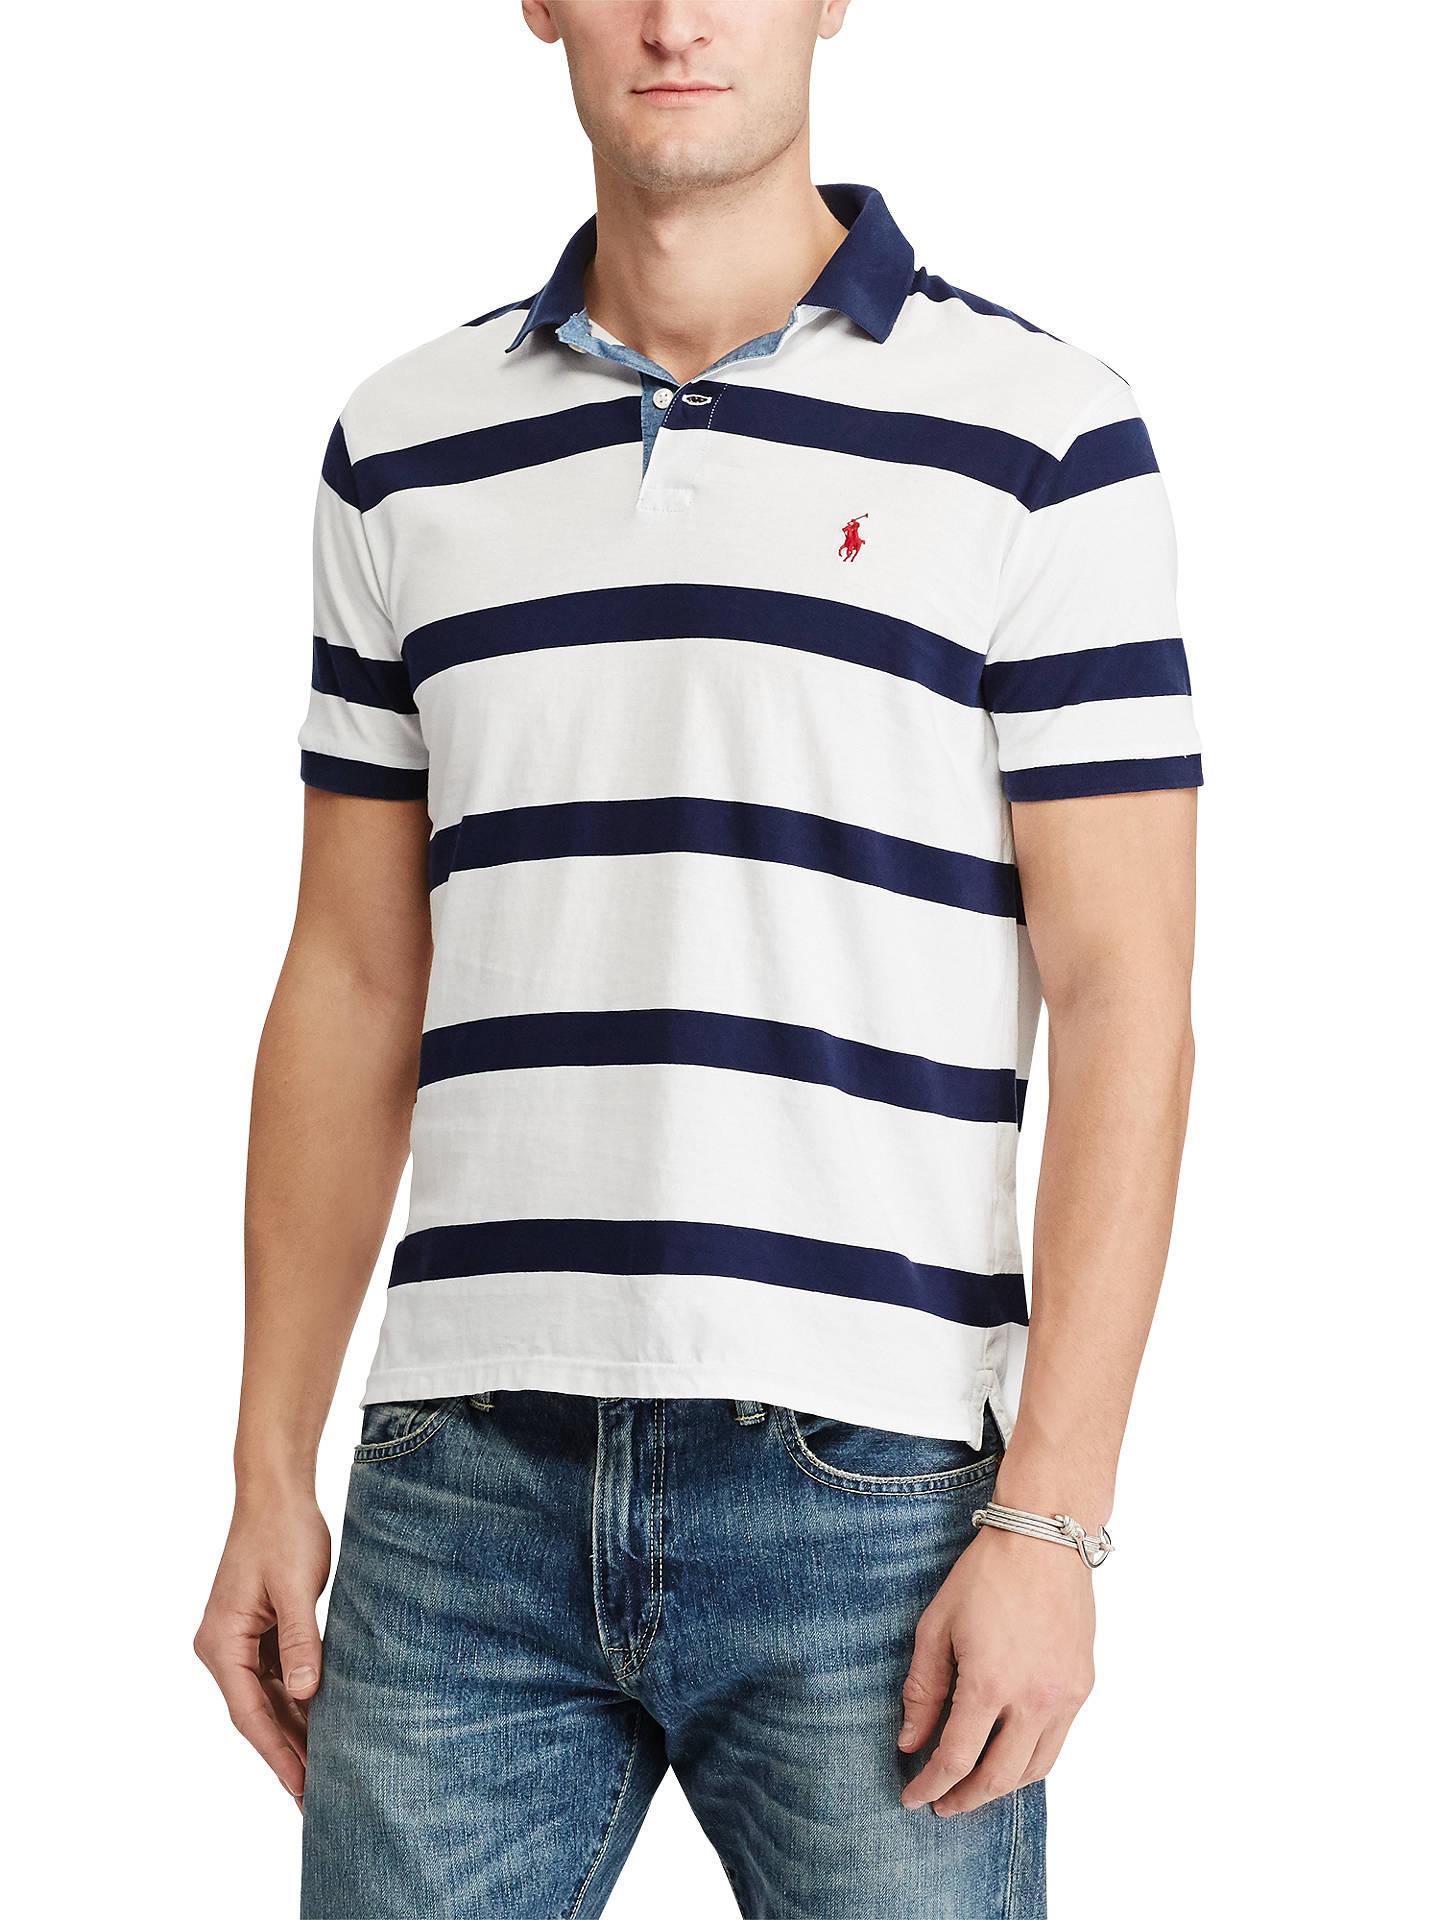 ShirtWhitenewport Ralph Polo Fit Slim Lauren Custom Cotton LRj4A53q